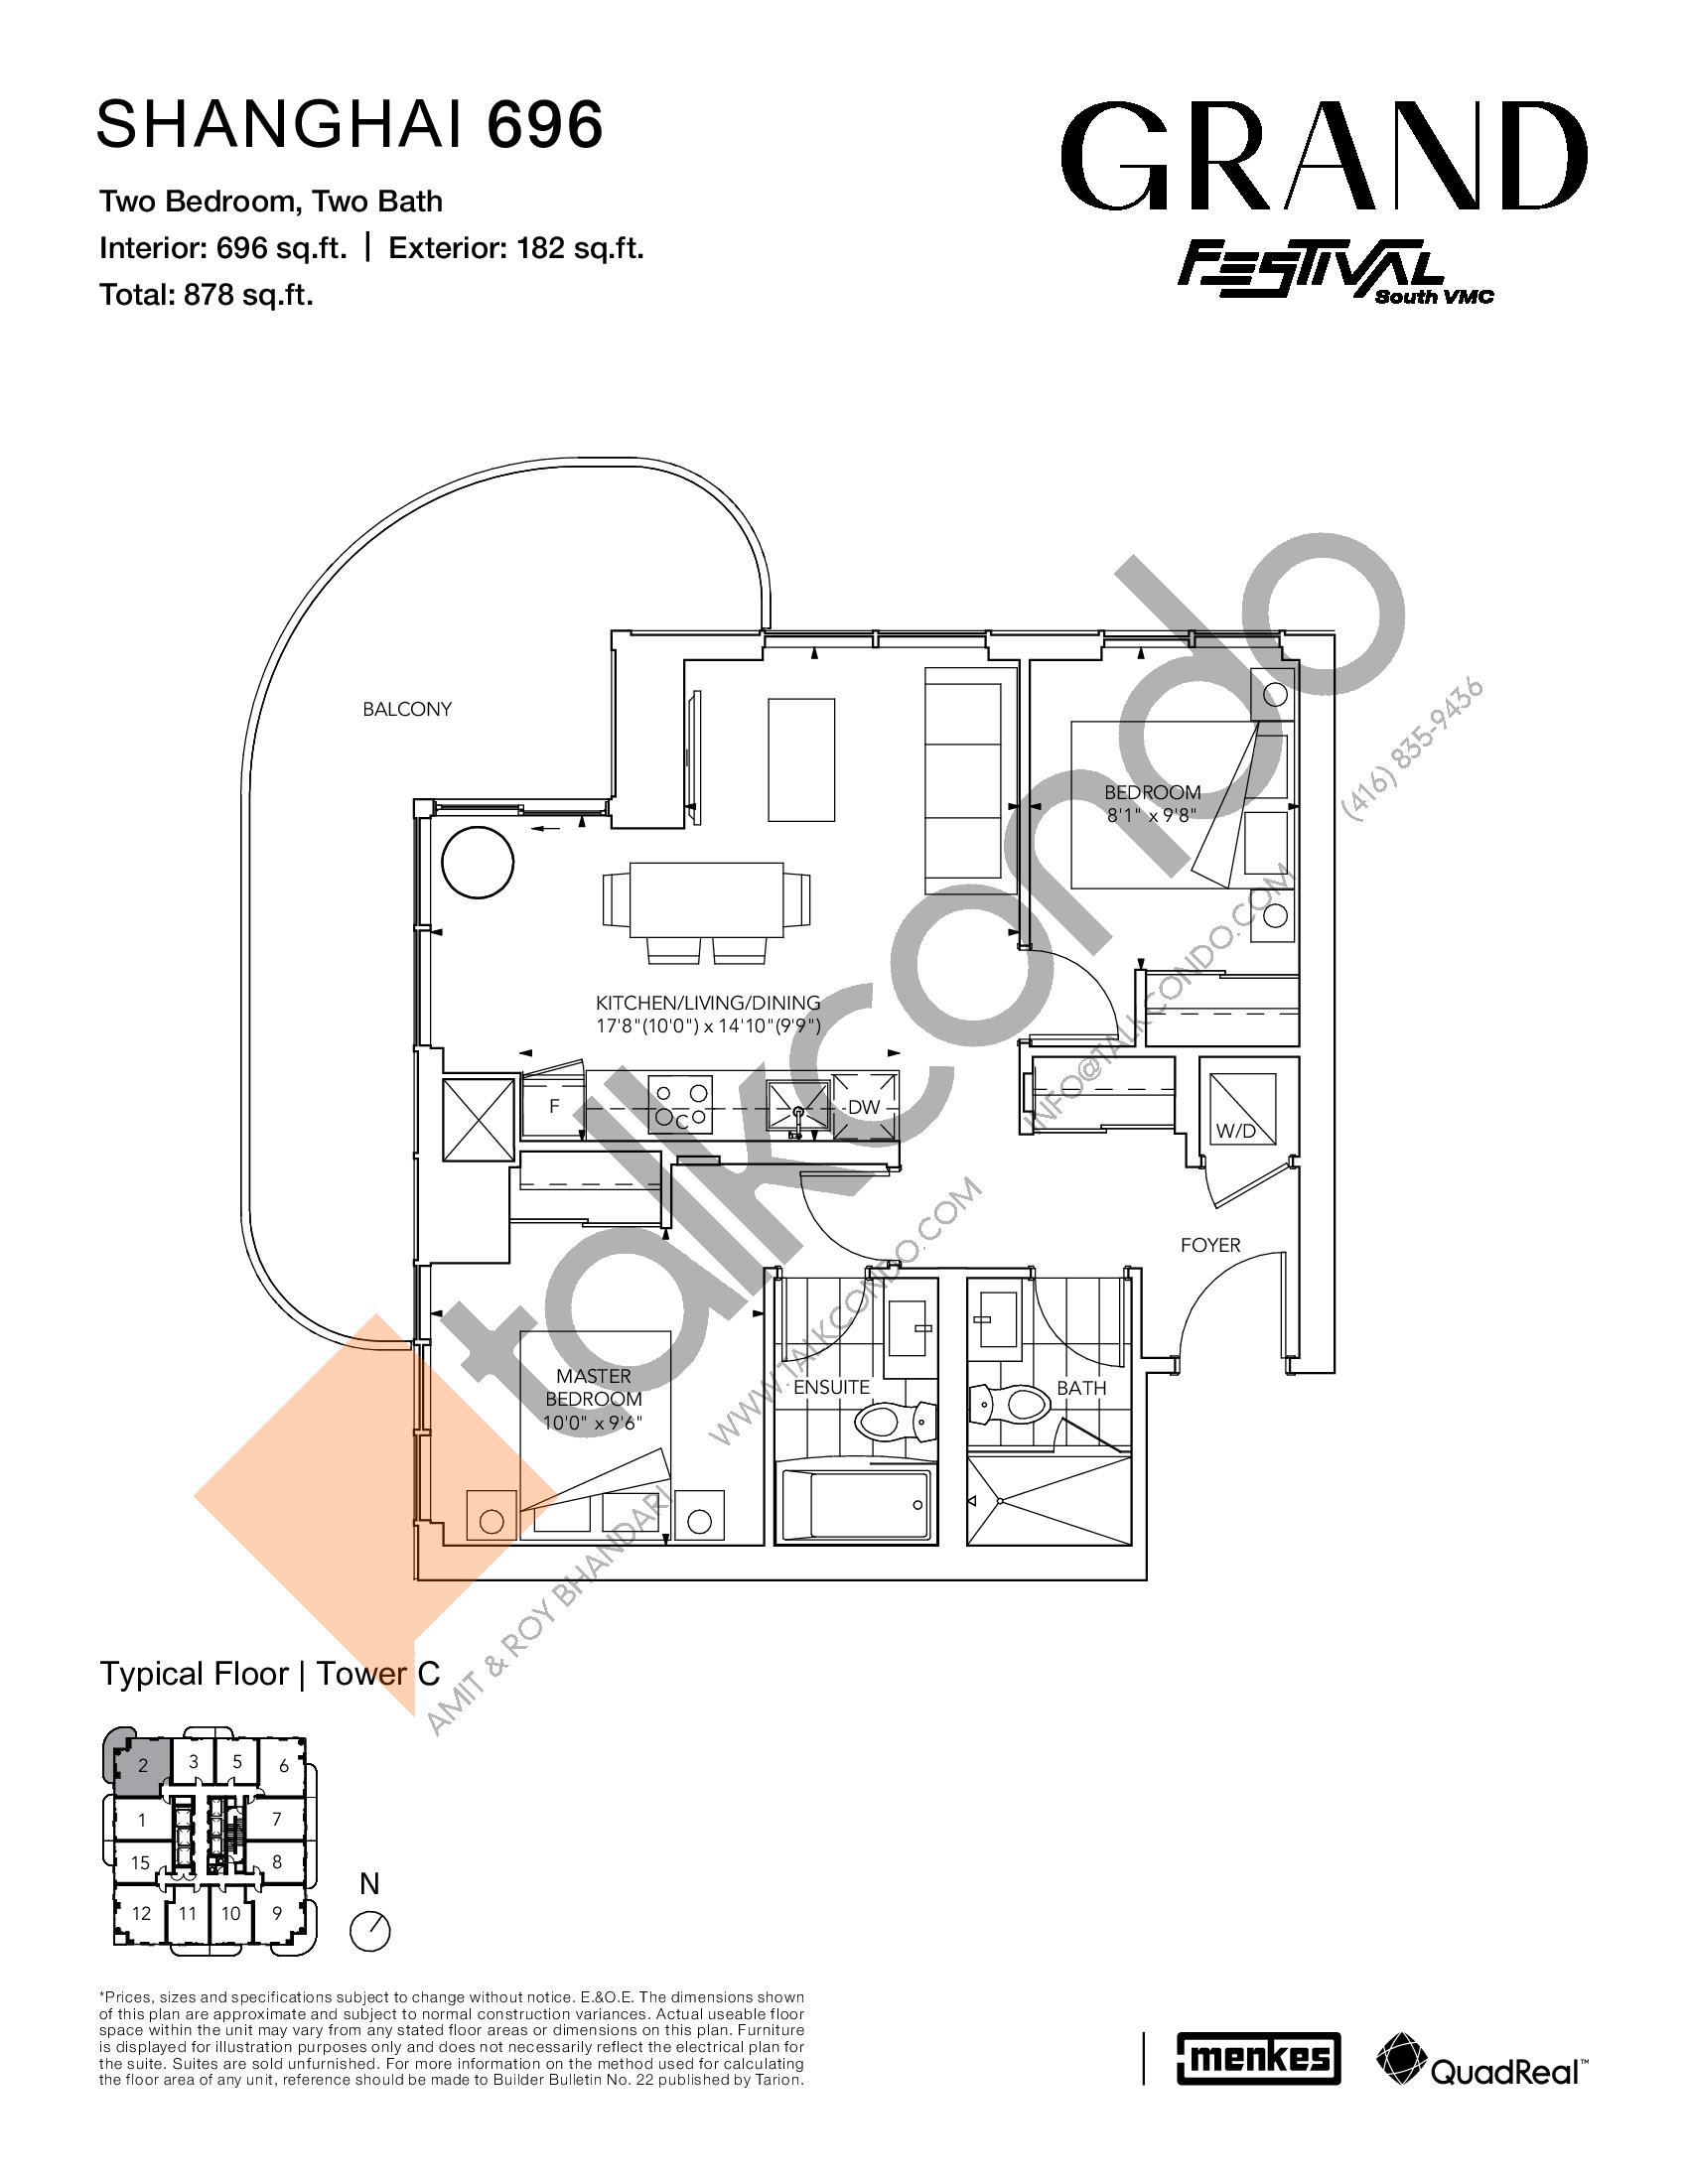 Shanghai 696 Floor Plan at Grand Festival Condos - 696 sq.ft